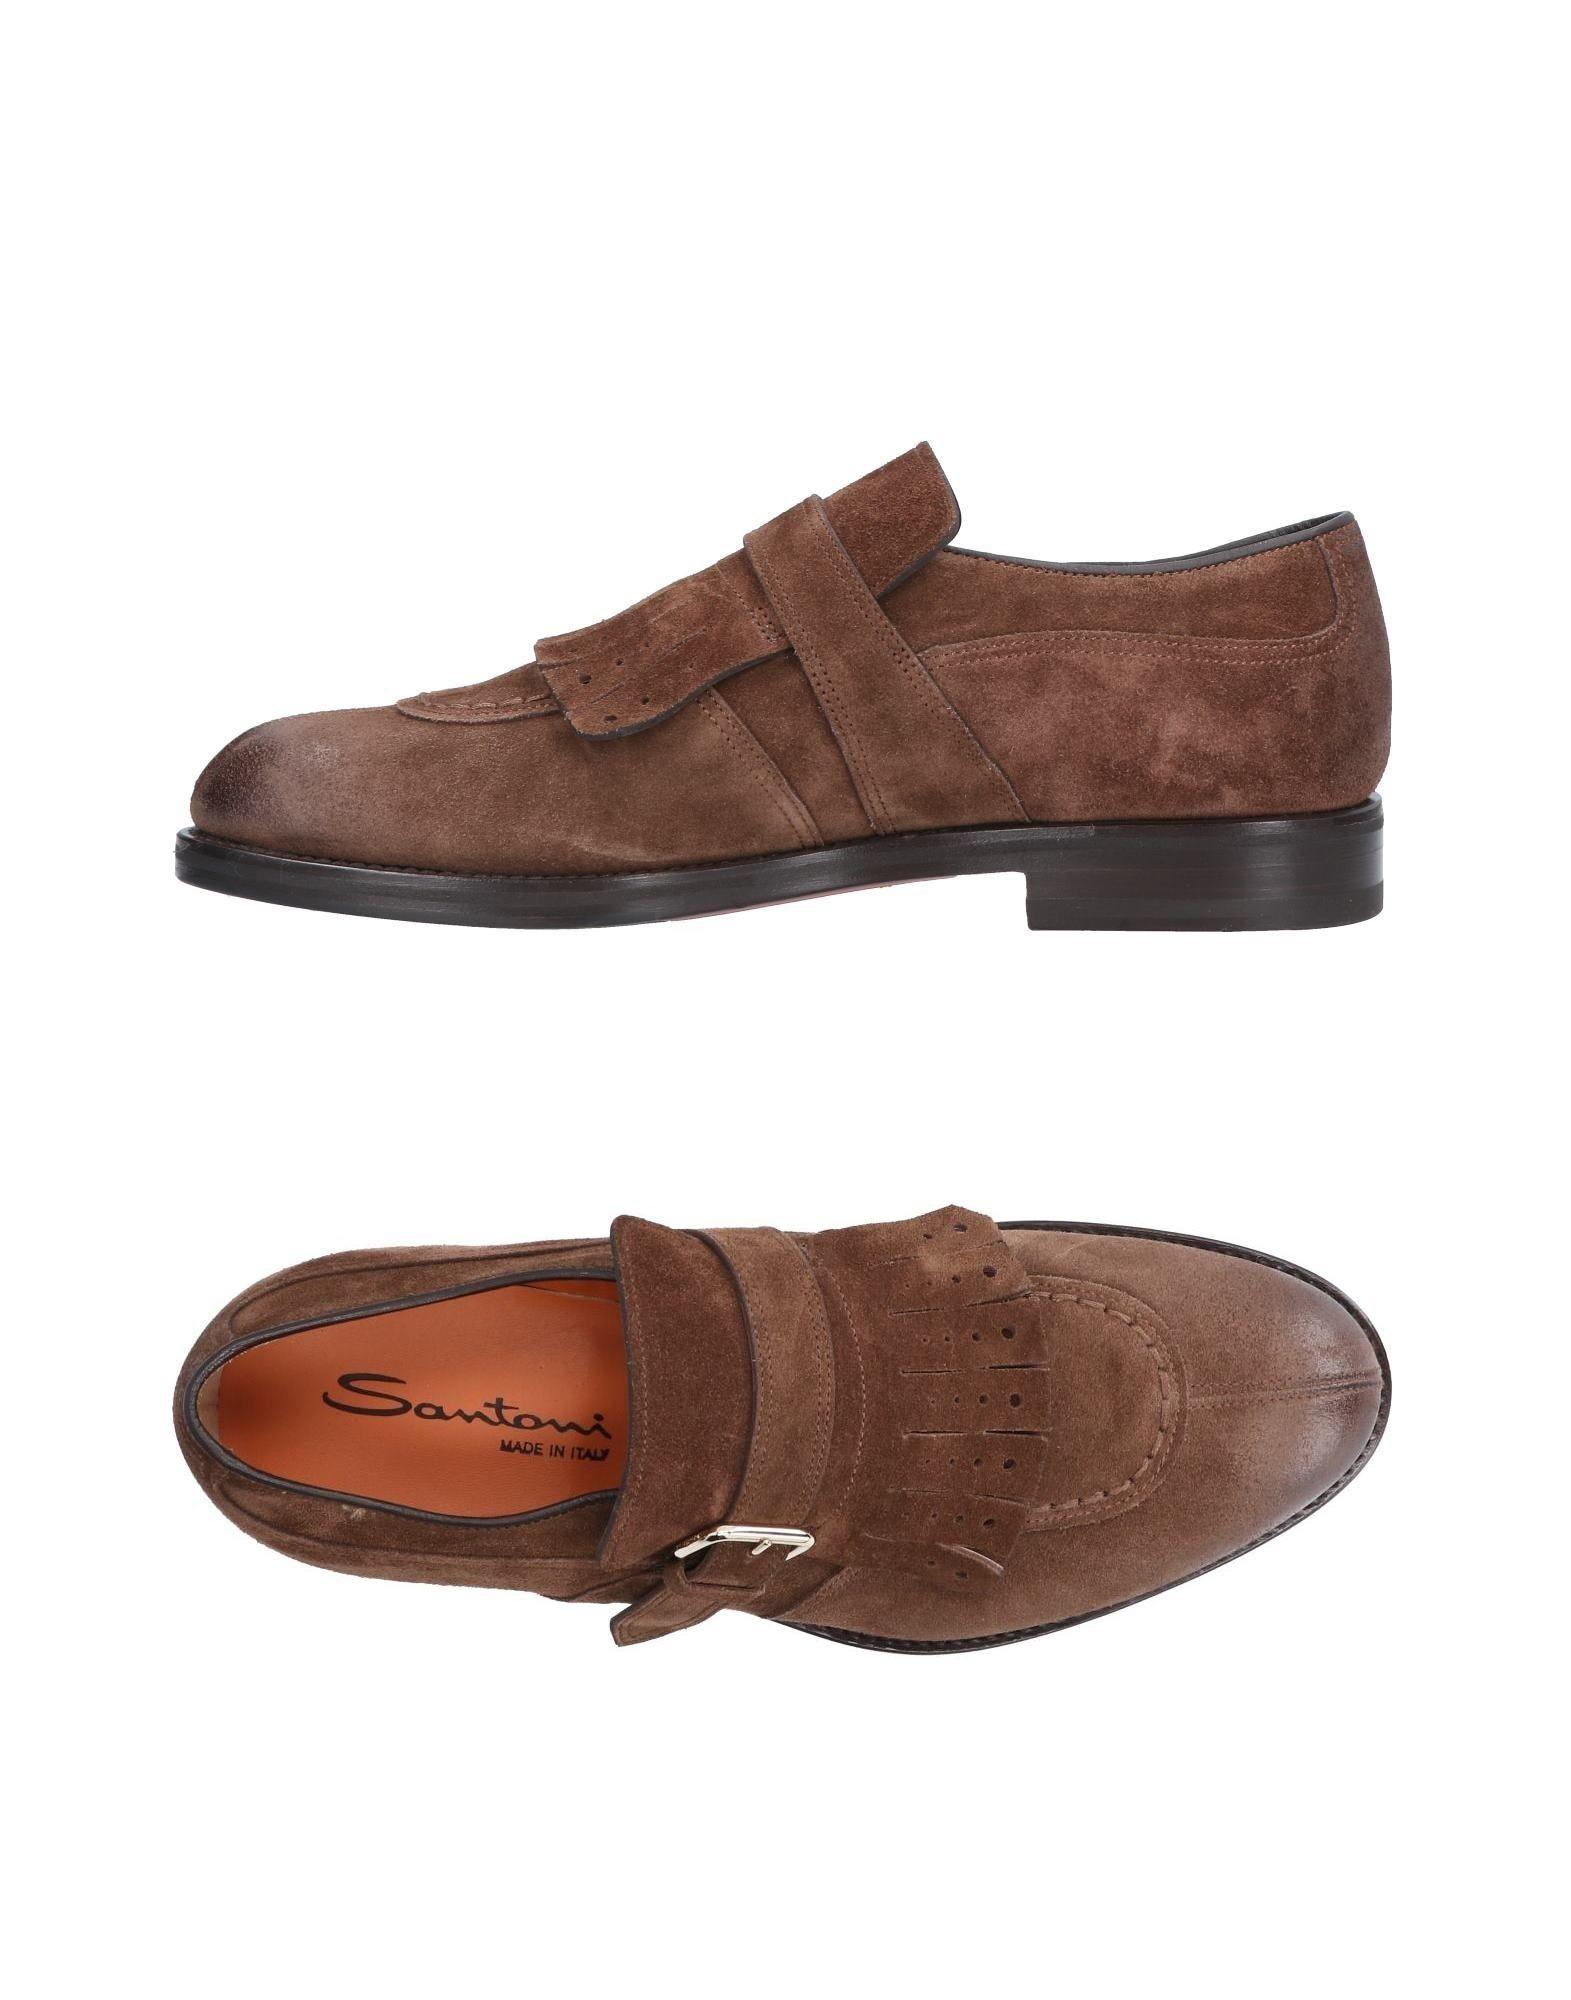 Santoni Mokassins Herren  11485493EG Gute Qualität beliebte Schuhe